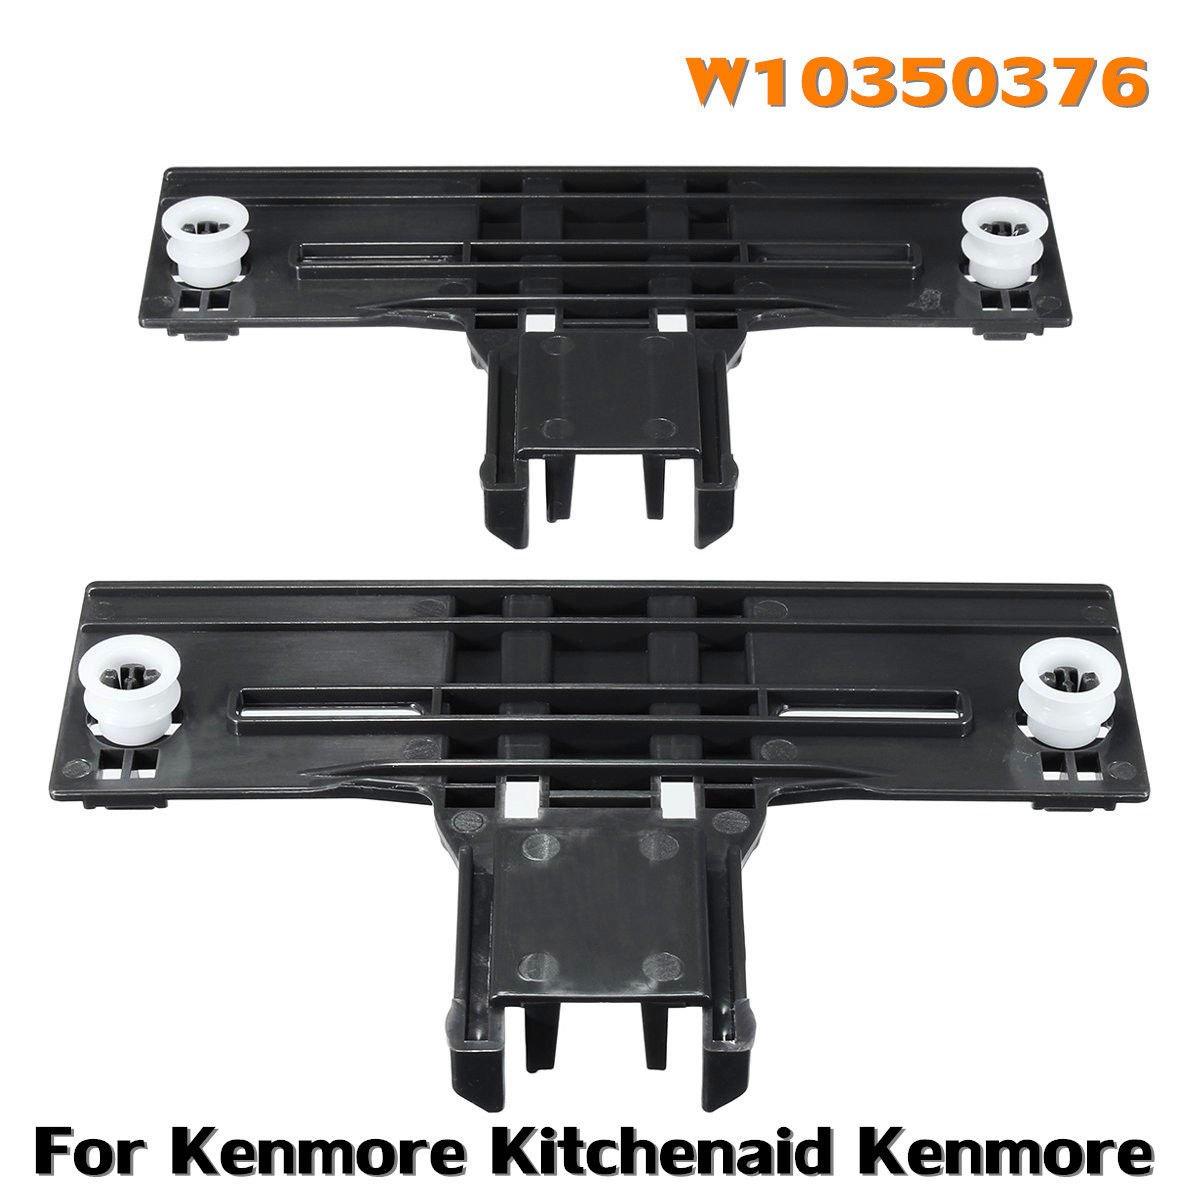 MAYITOP 2Pcs W10350376 Dishwasher Upper Rack Adjuster Kit for Whirlpool Kitchenaid Kenmore,W10253546, AP5272176, PS3497383